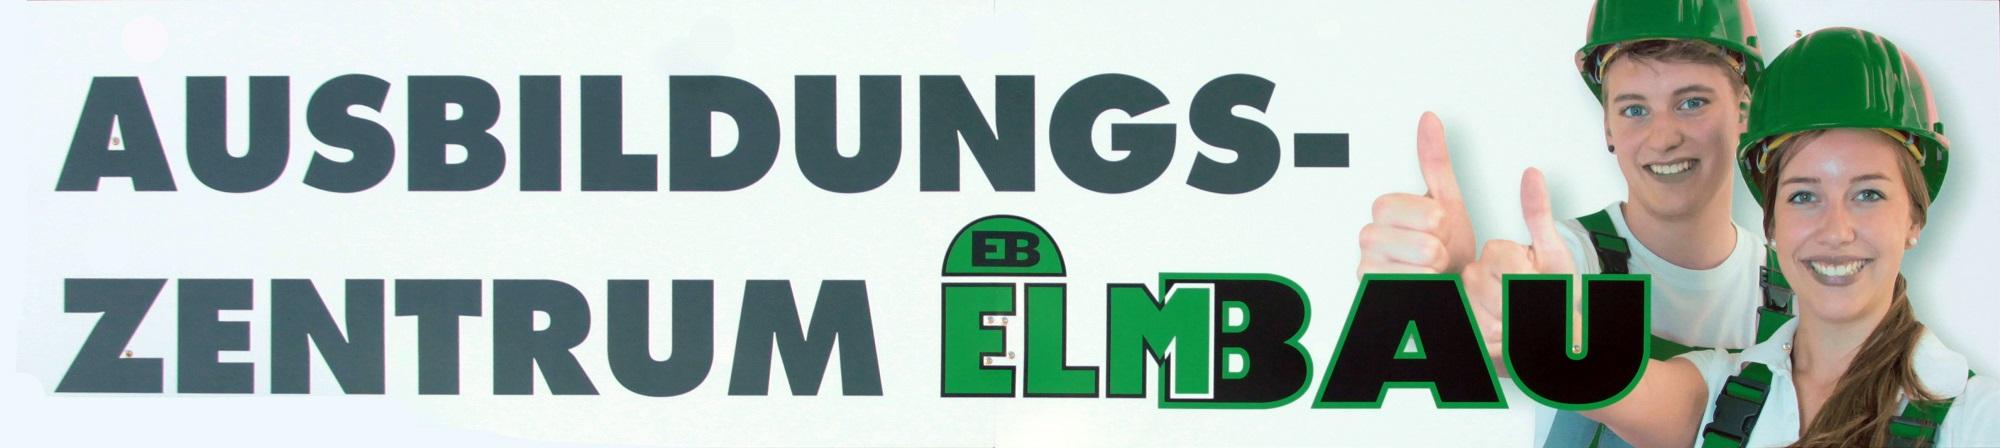 ausbildungszentrum-elmbau-koenigslutter